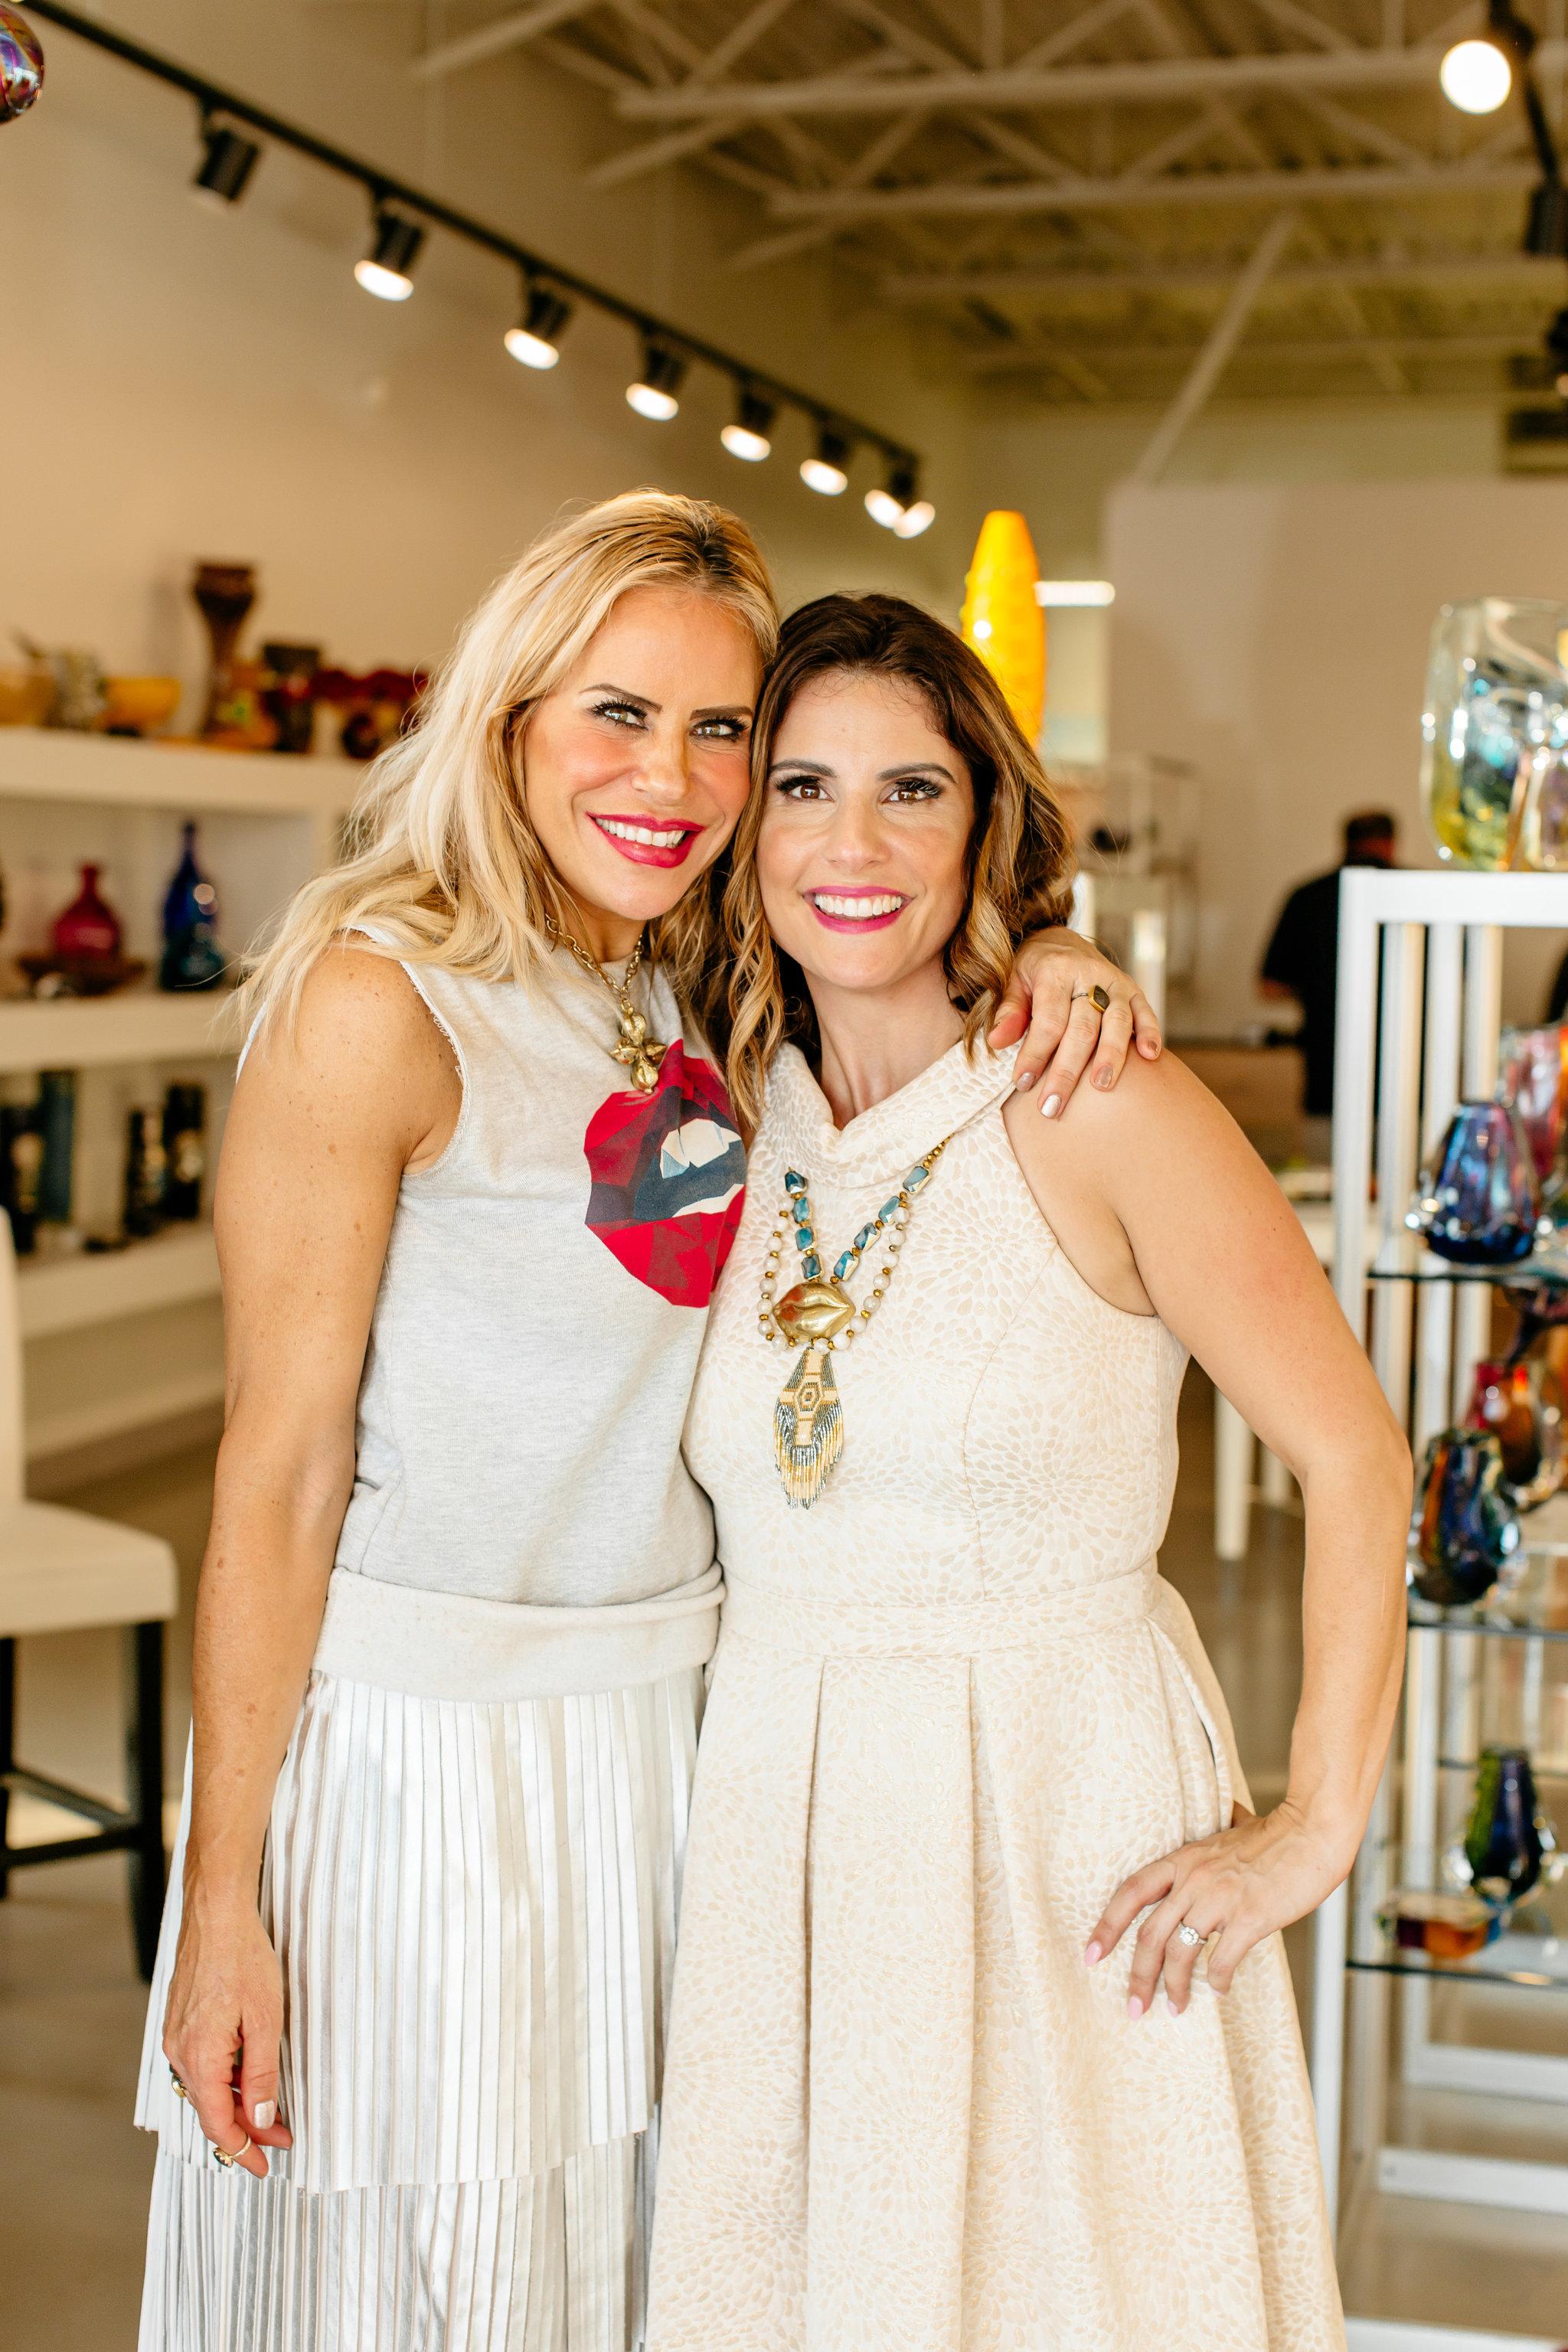 Alexa-Vossler-Photo_Dallas-Event-Photographer_Brite-Bar-Beauty-2018-Lipstick-Launch-Party-27.jpg